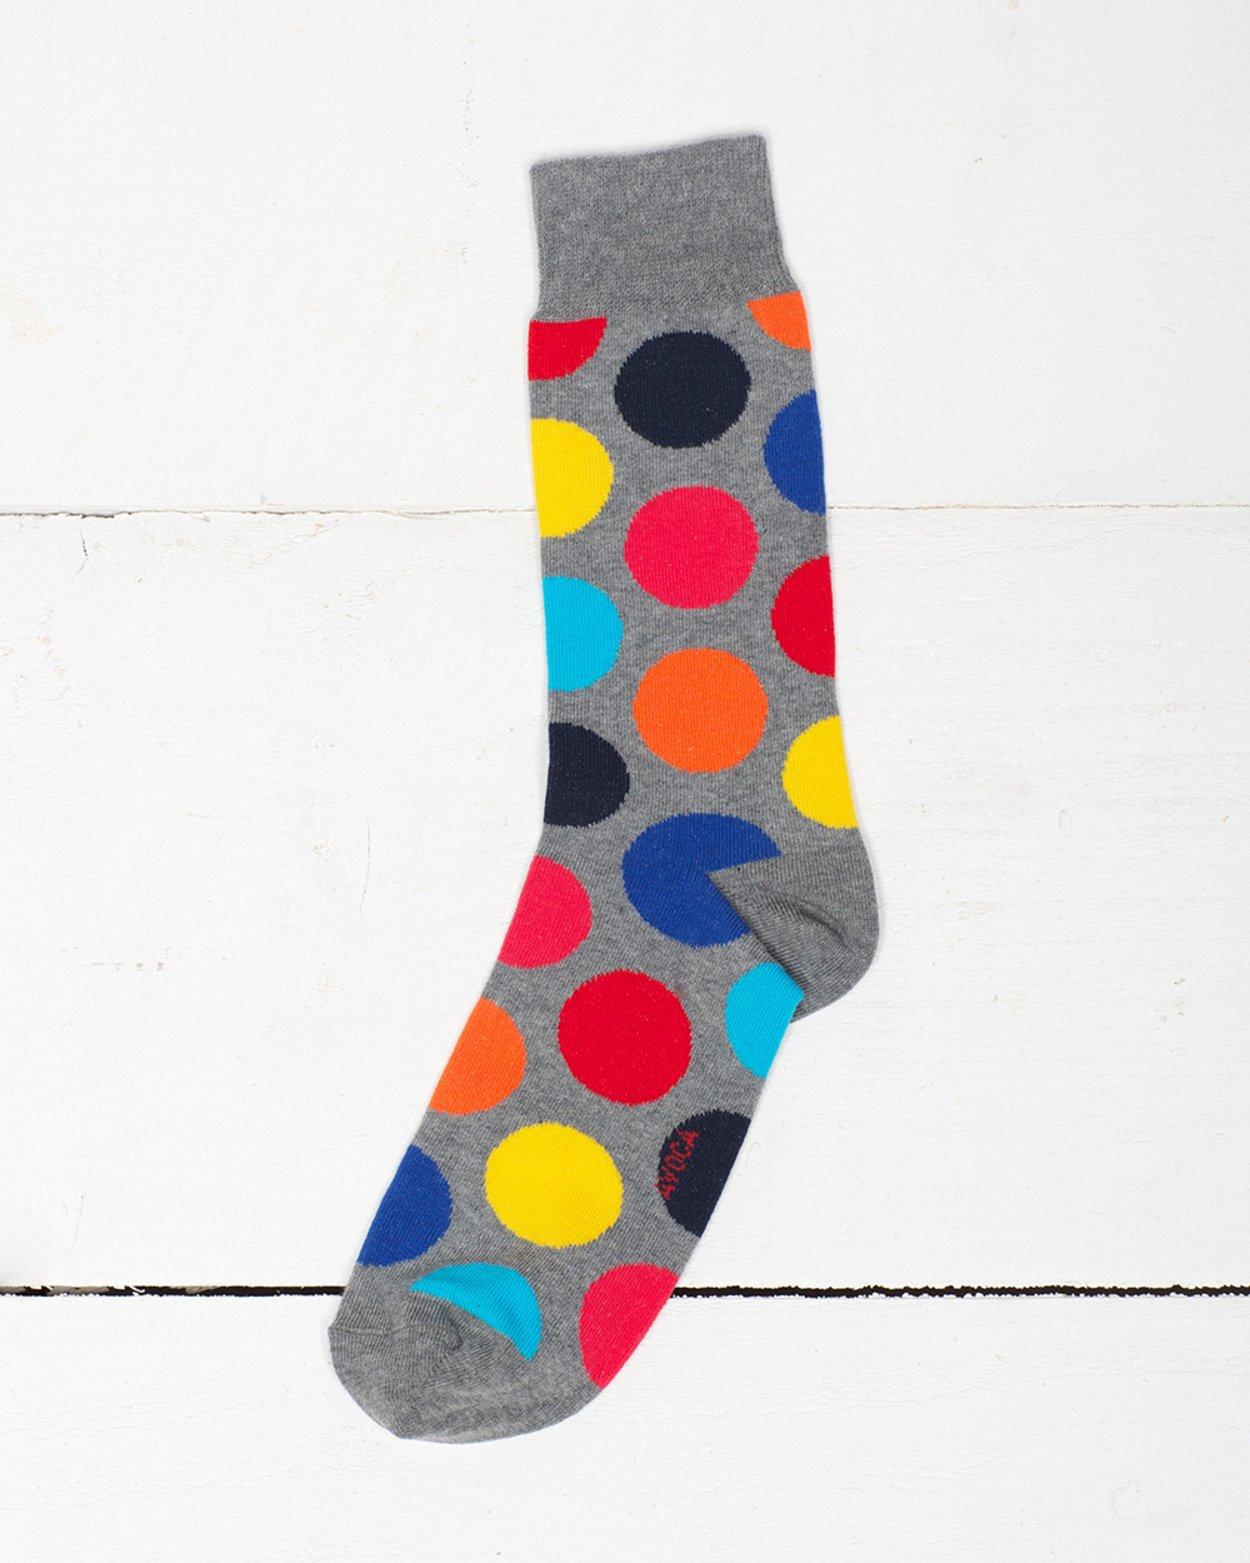 Odd Spot Socks